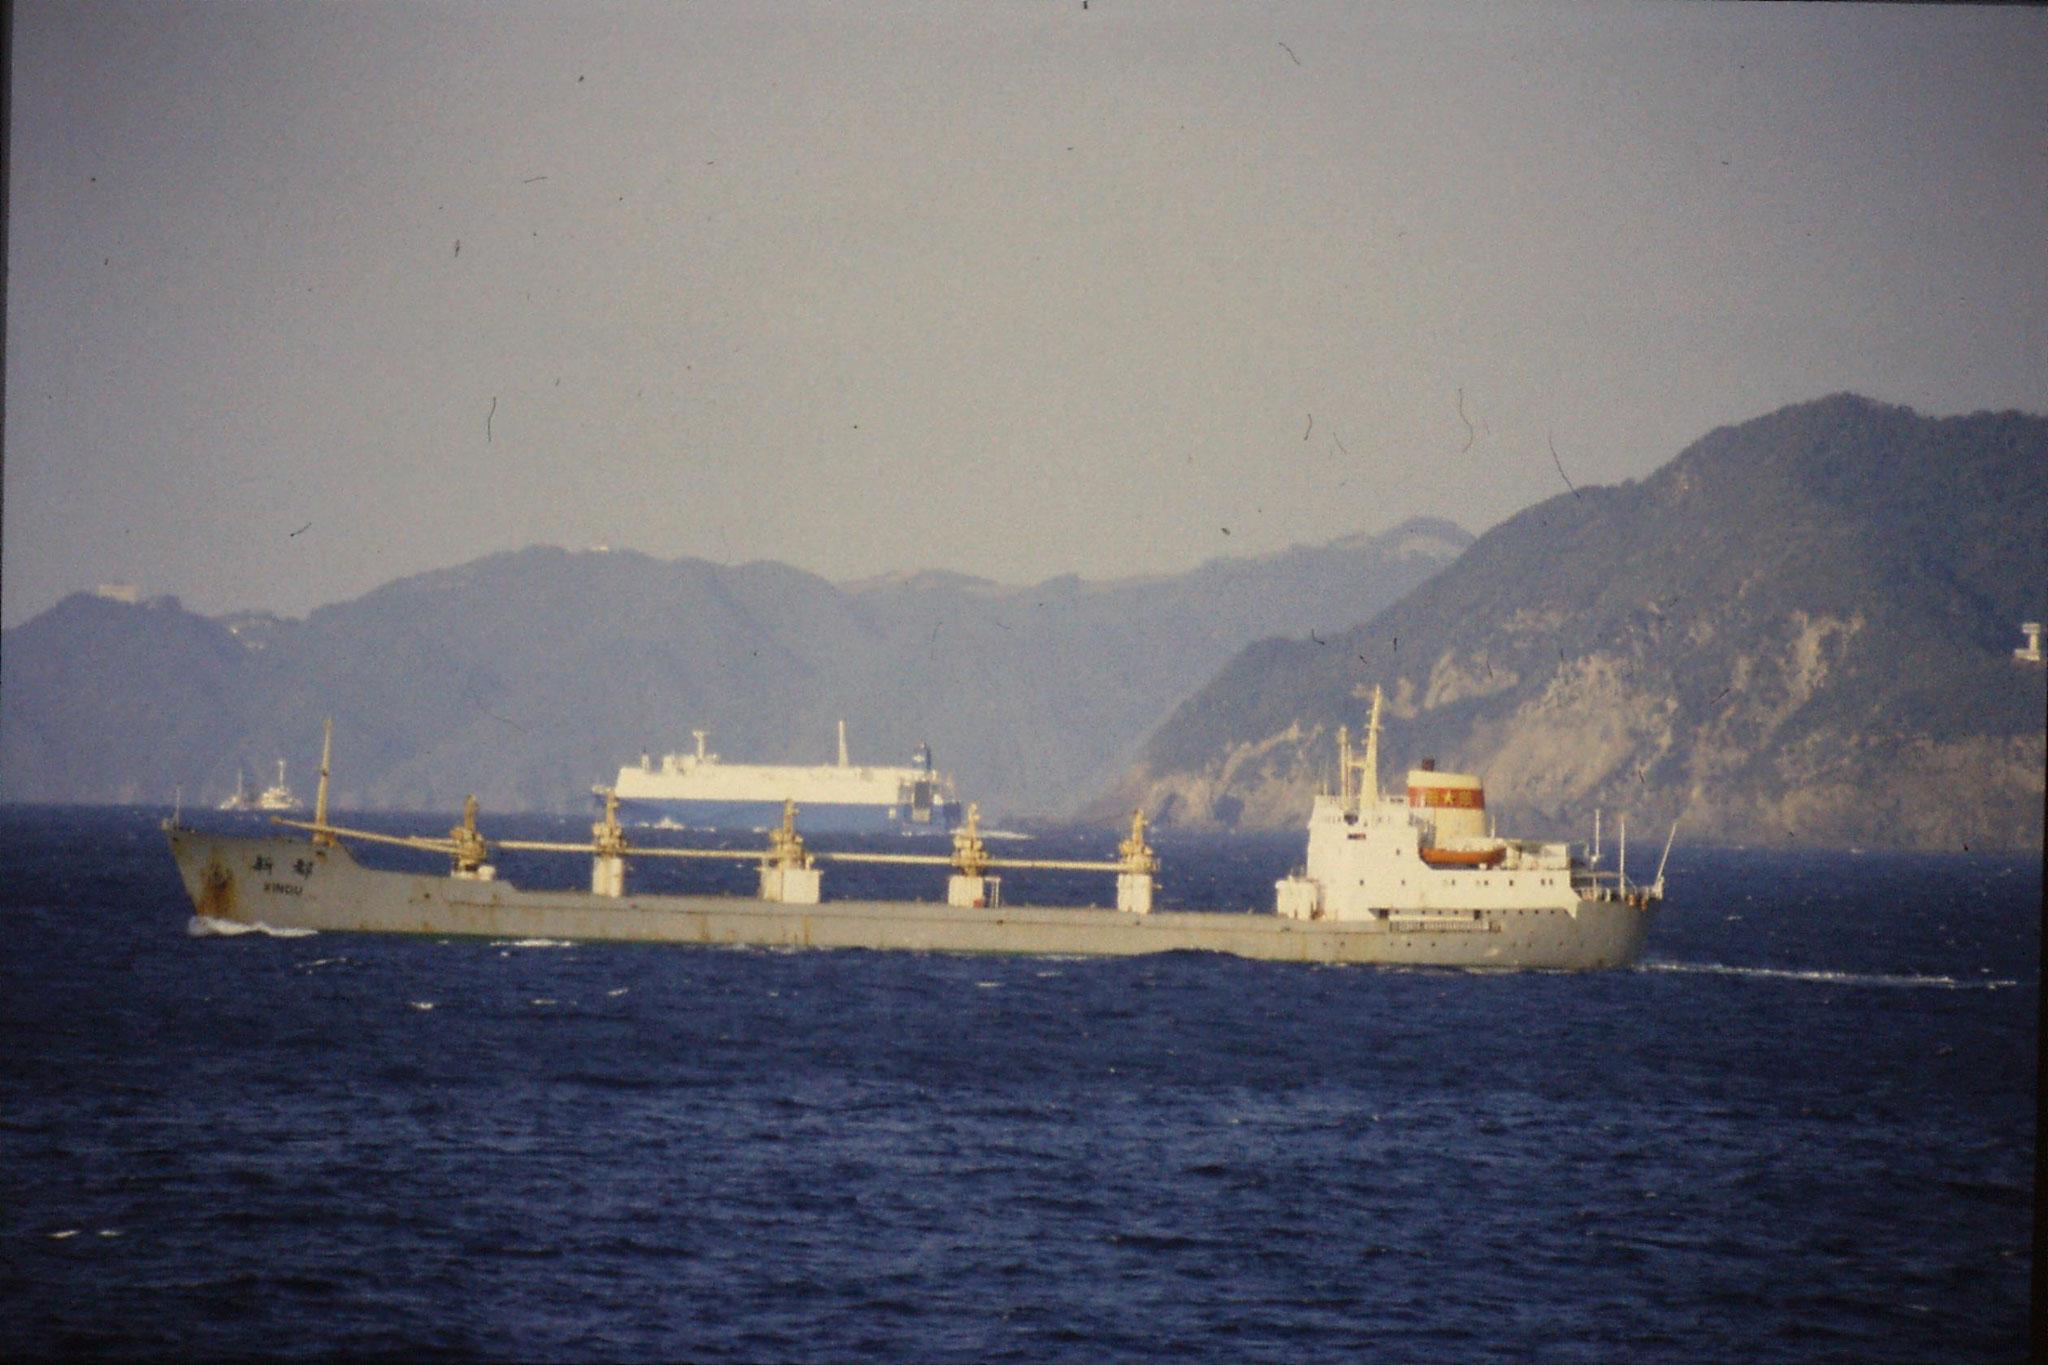 18/12/1988: 20: Japanese coast